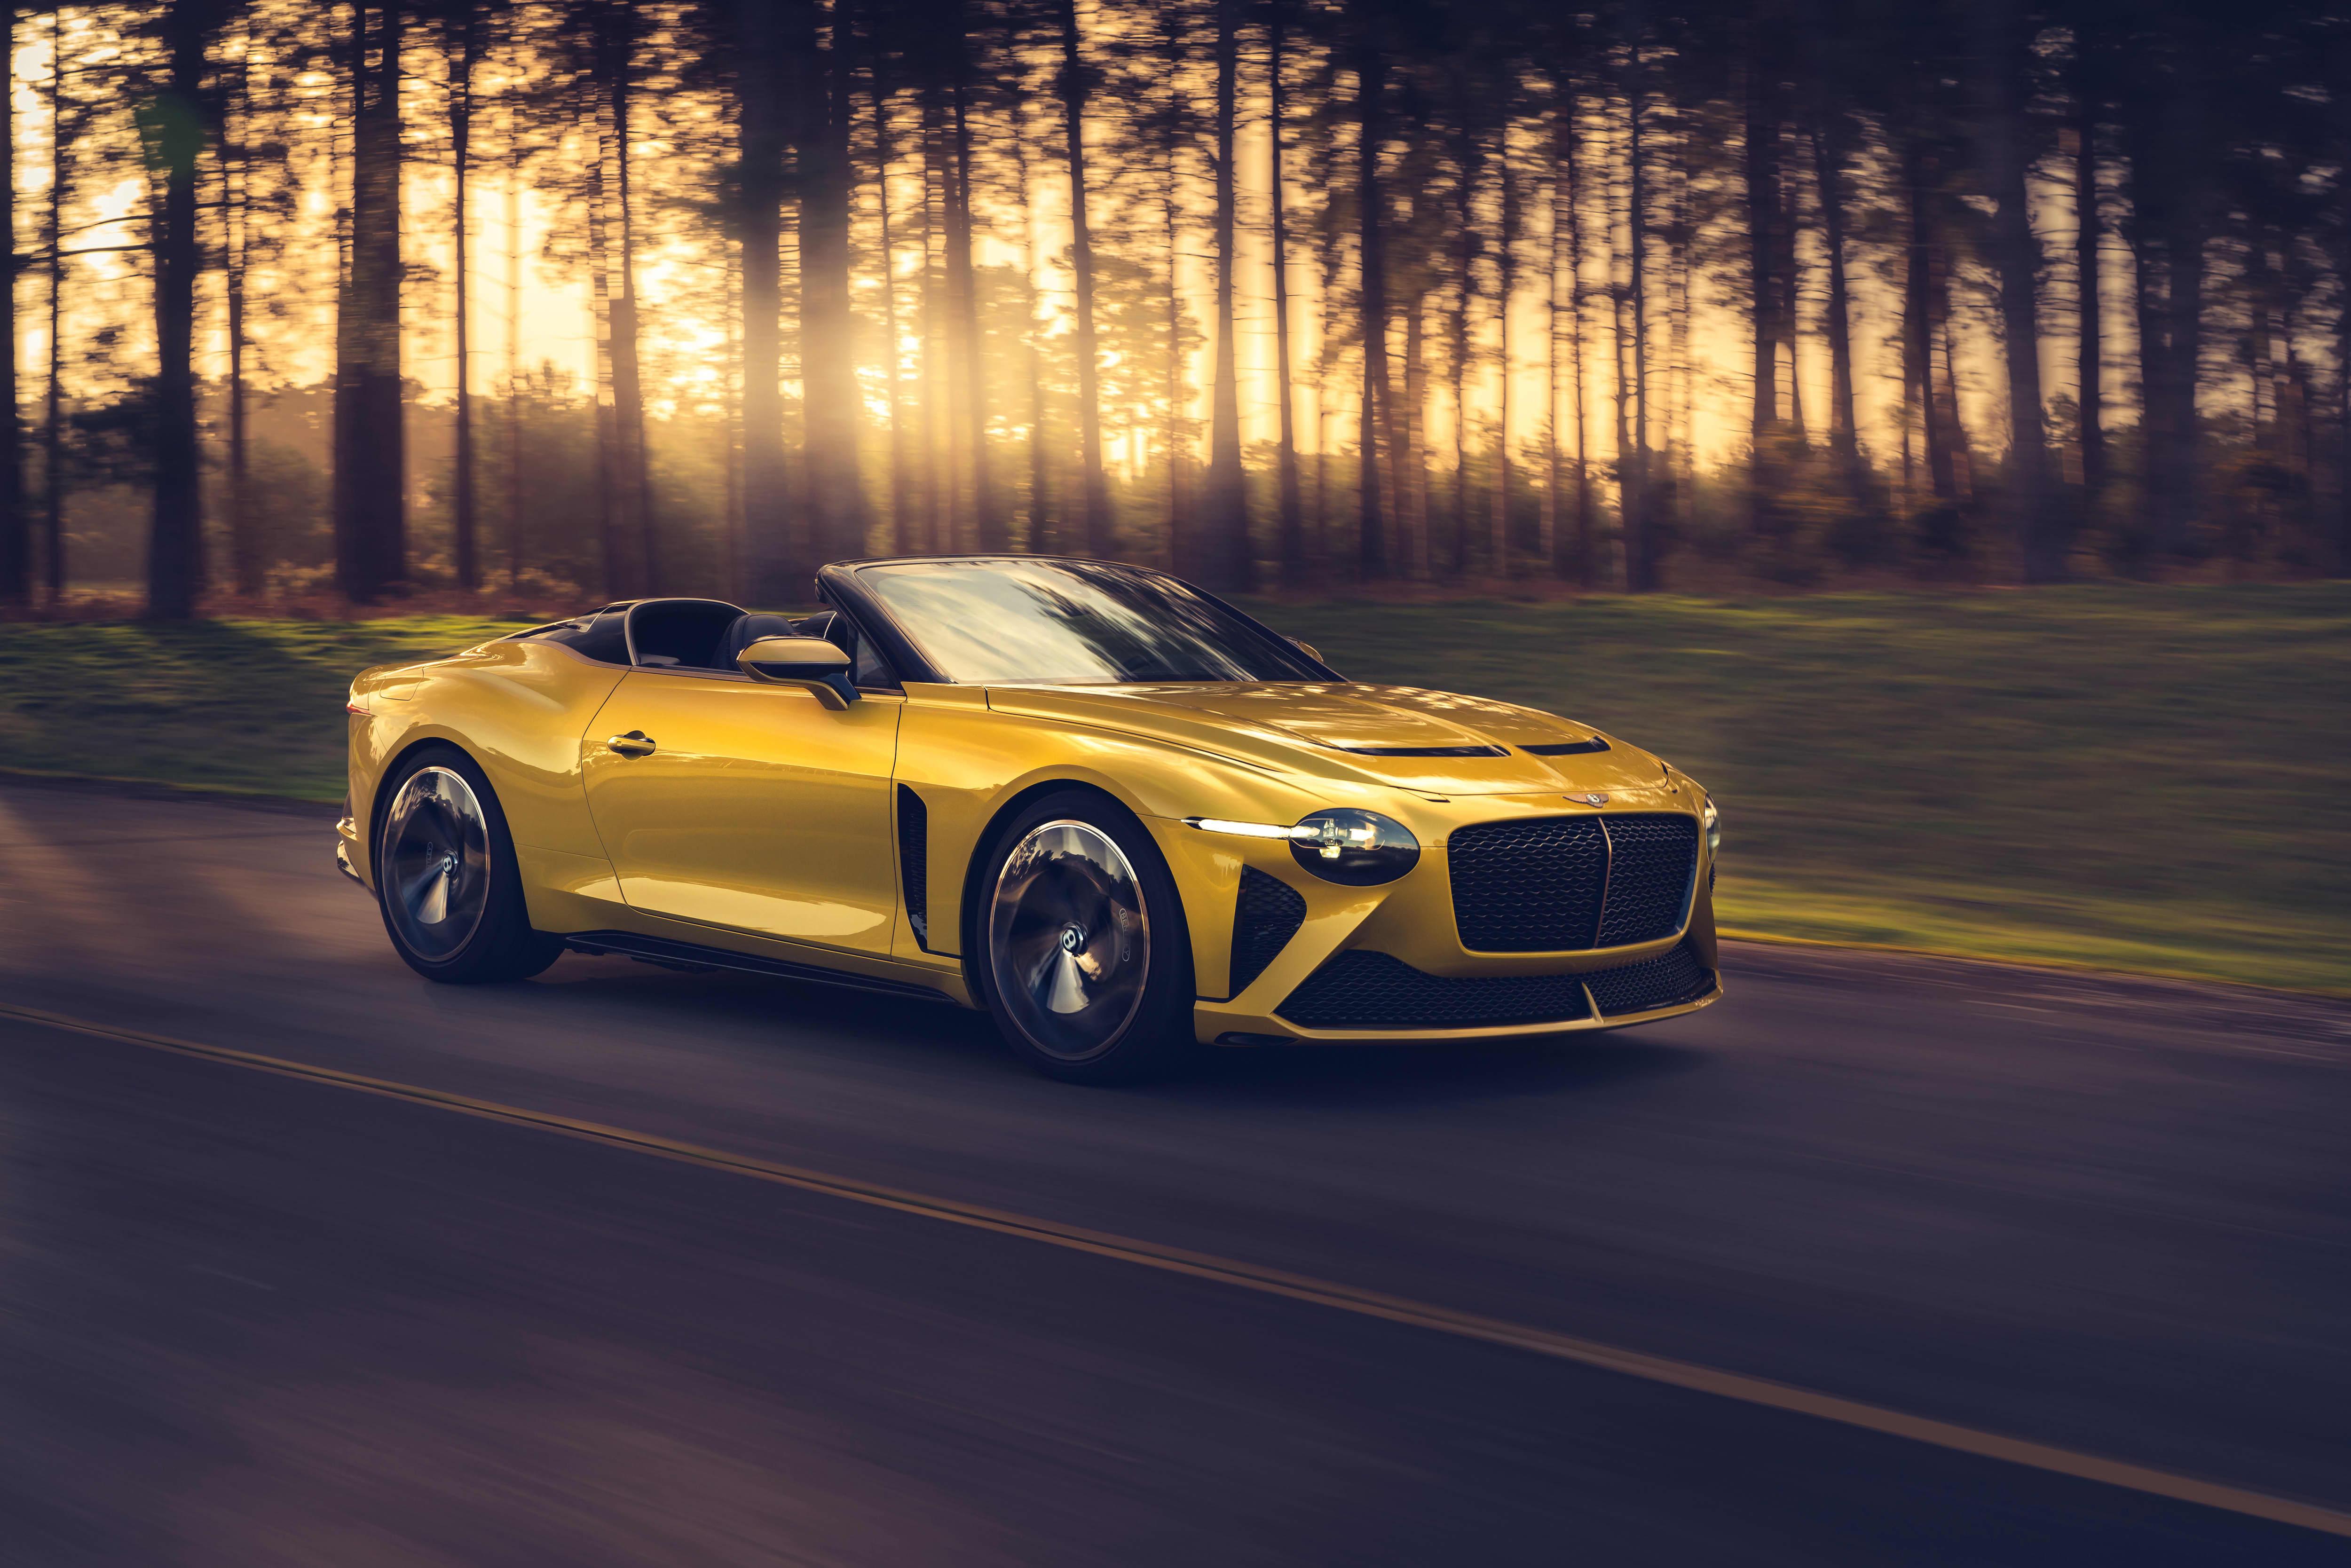 Bentley Aston Martin Cutting Jobs As Coronavirus Derails Luxury Sales